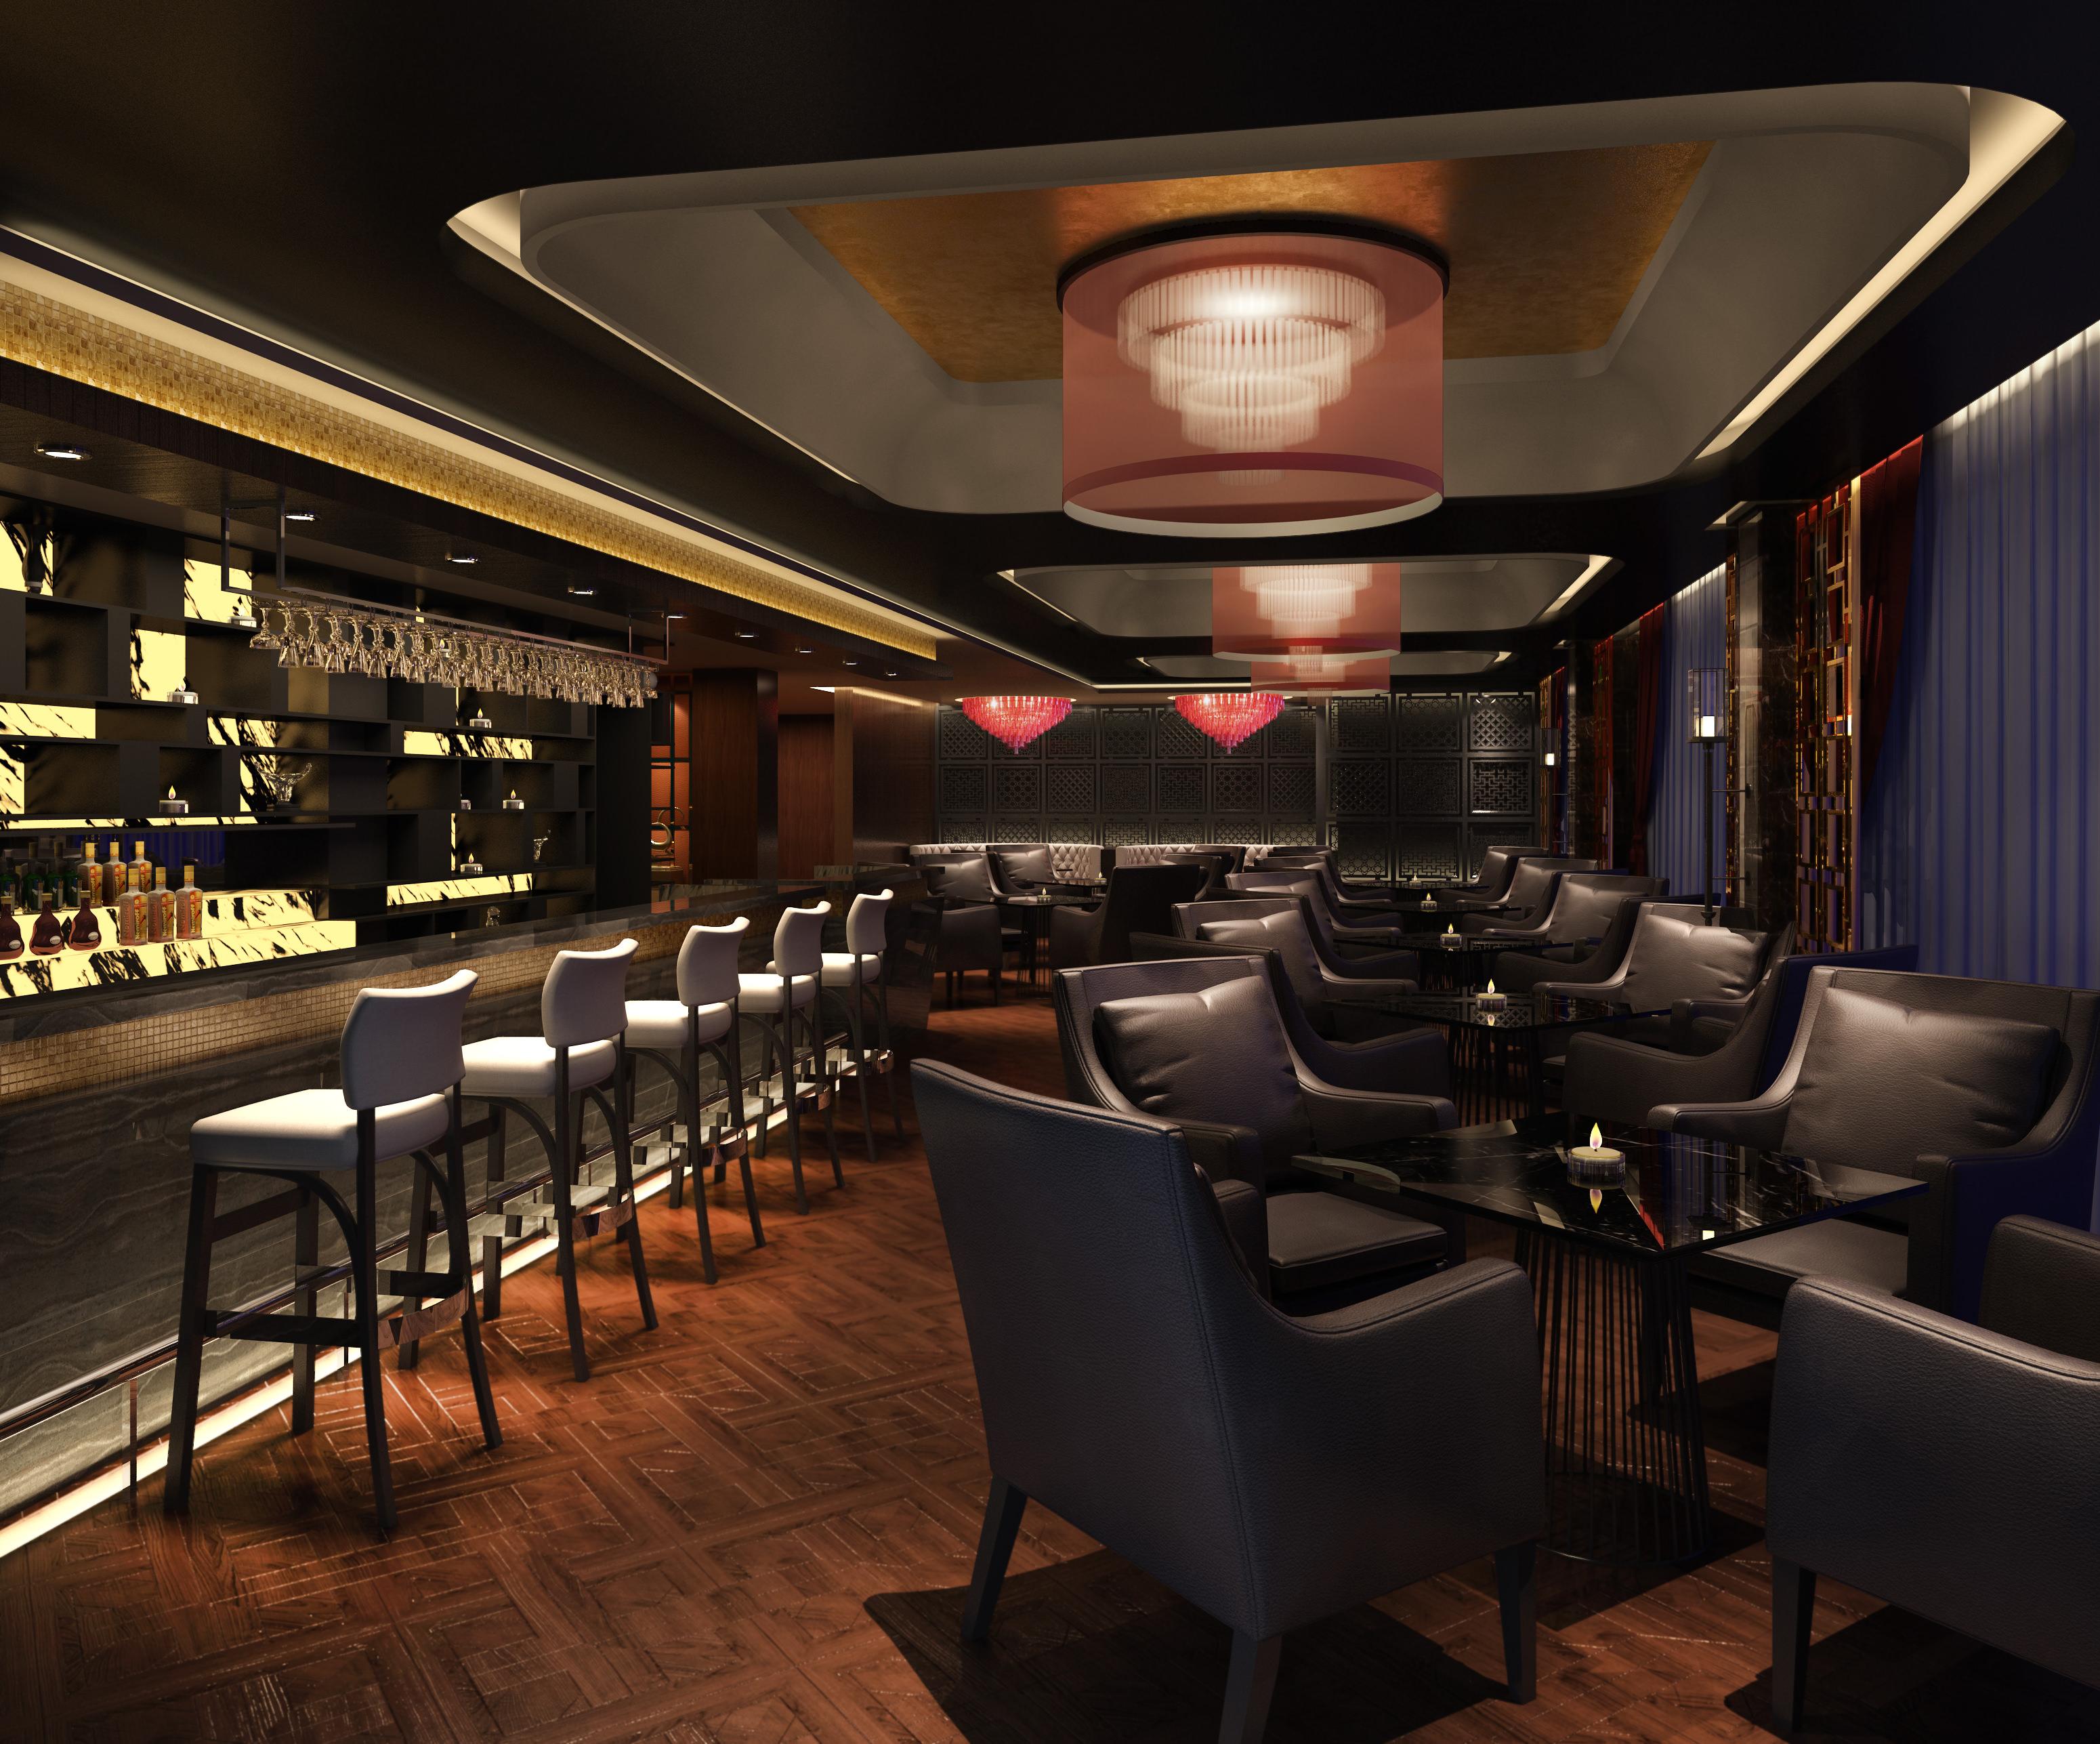 Restaurant Kitchen 3d Model restaurant bar 24578 3d model | cgtrader